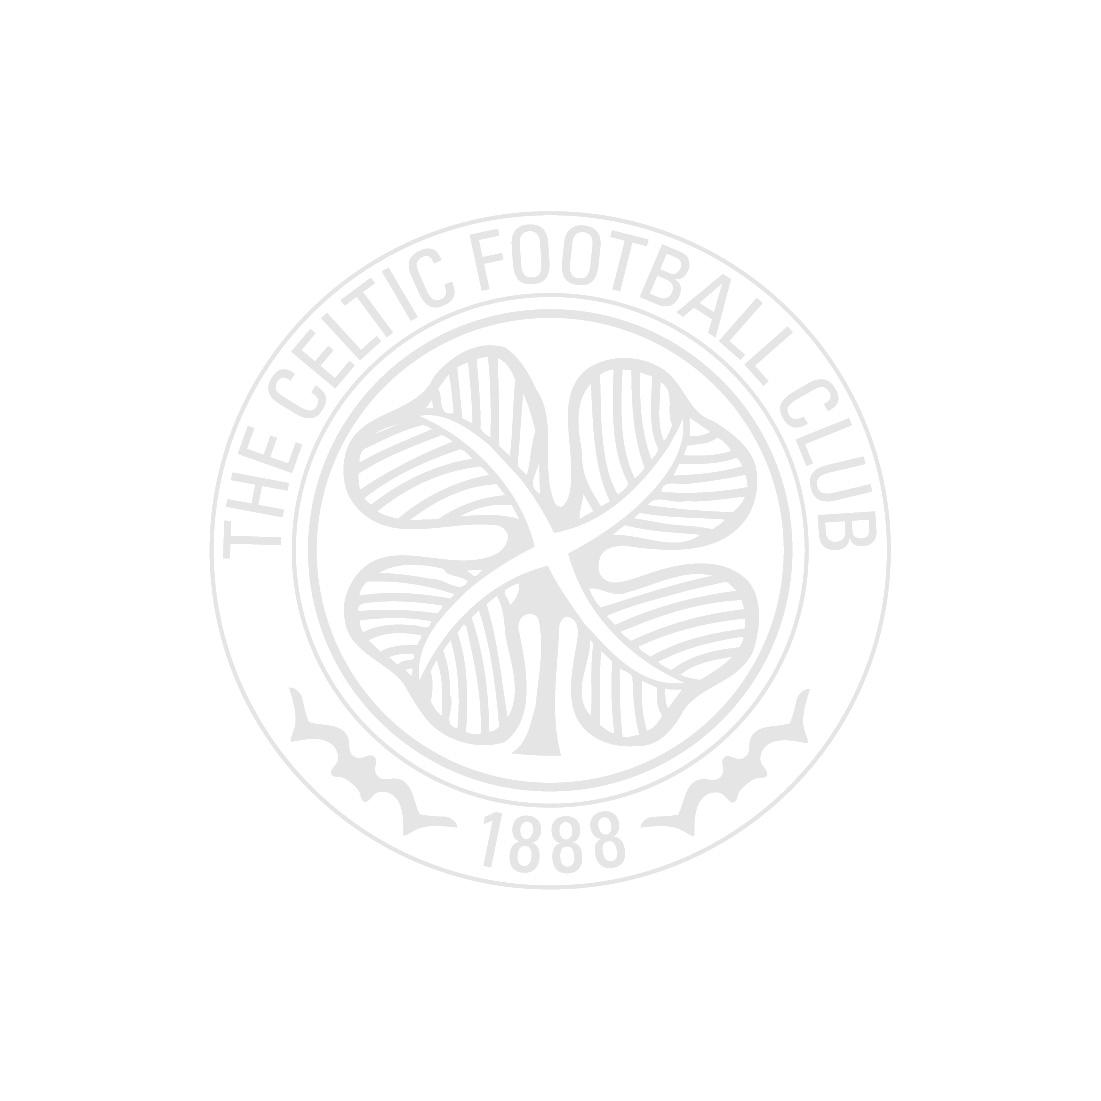 Celtic Older Girls Hoops T-shirt